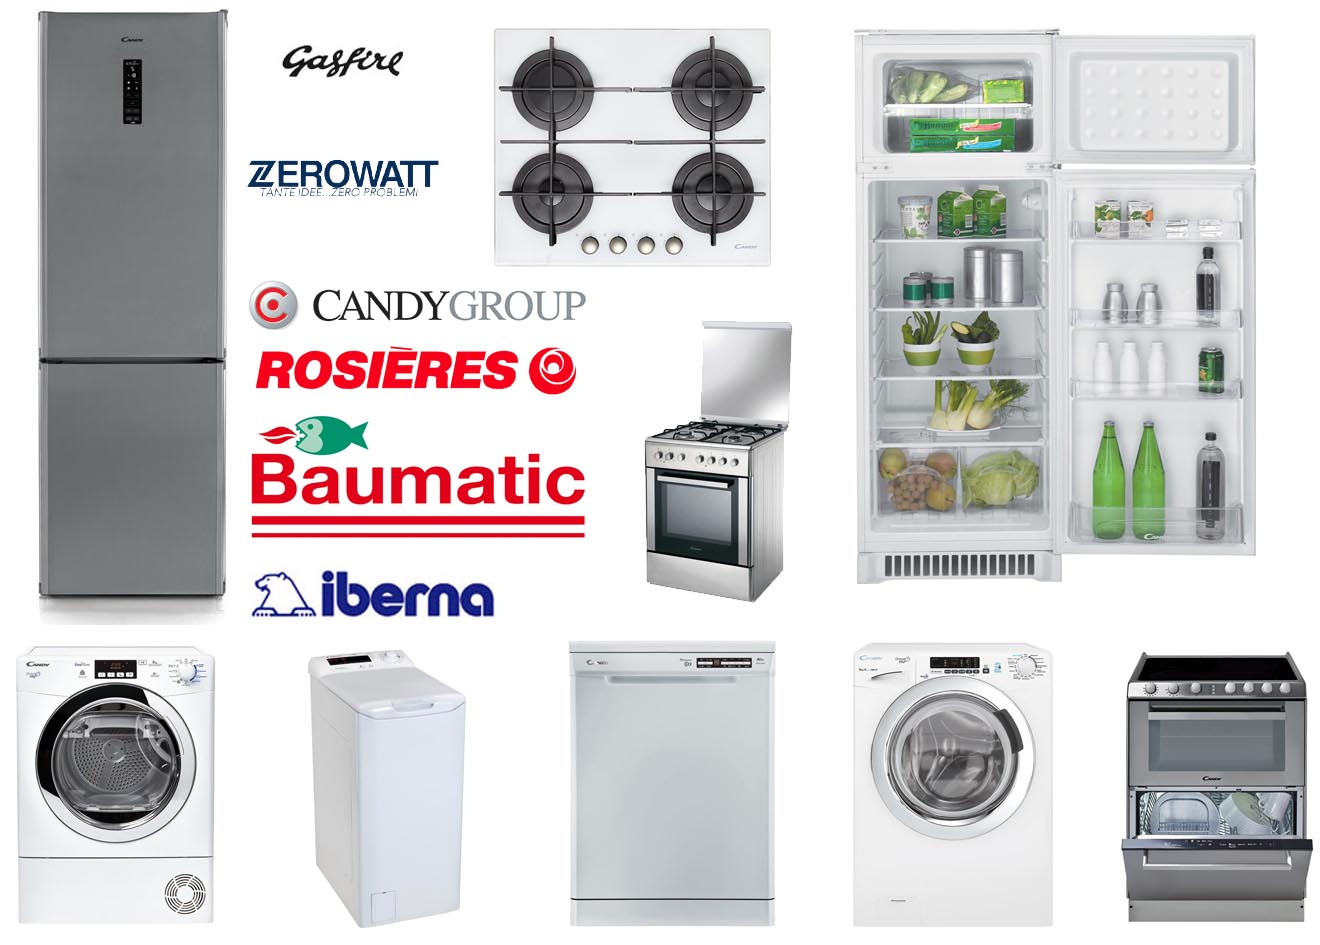 Assistenza e riparazione Candy - Hoover - Rosières - Vyatka - Zerowatt - Iberna - Jinling - Süsler - Gasfire - Baumatic Bologna e provincia